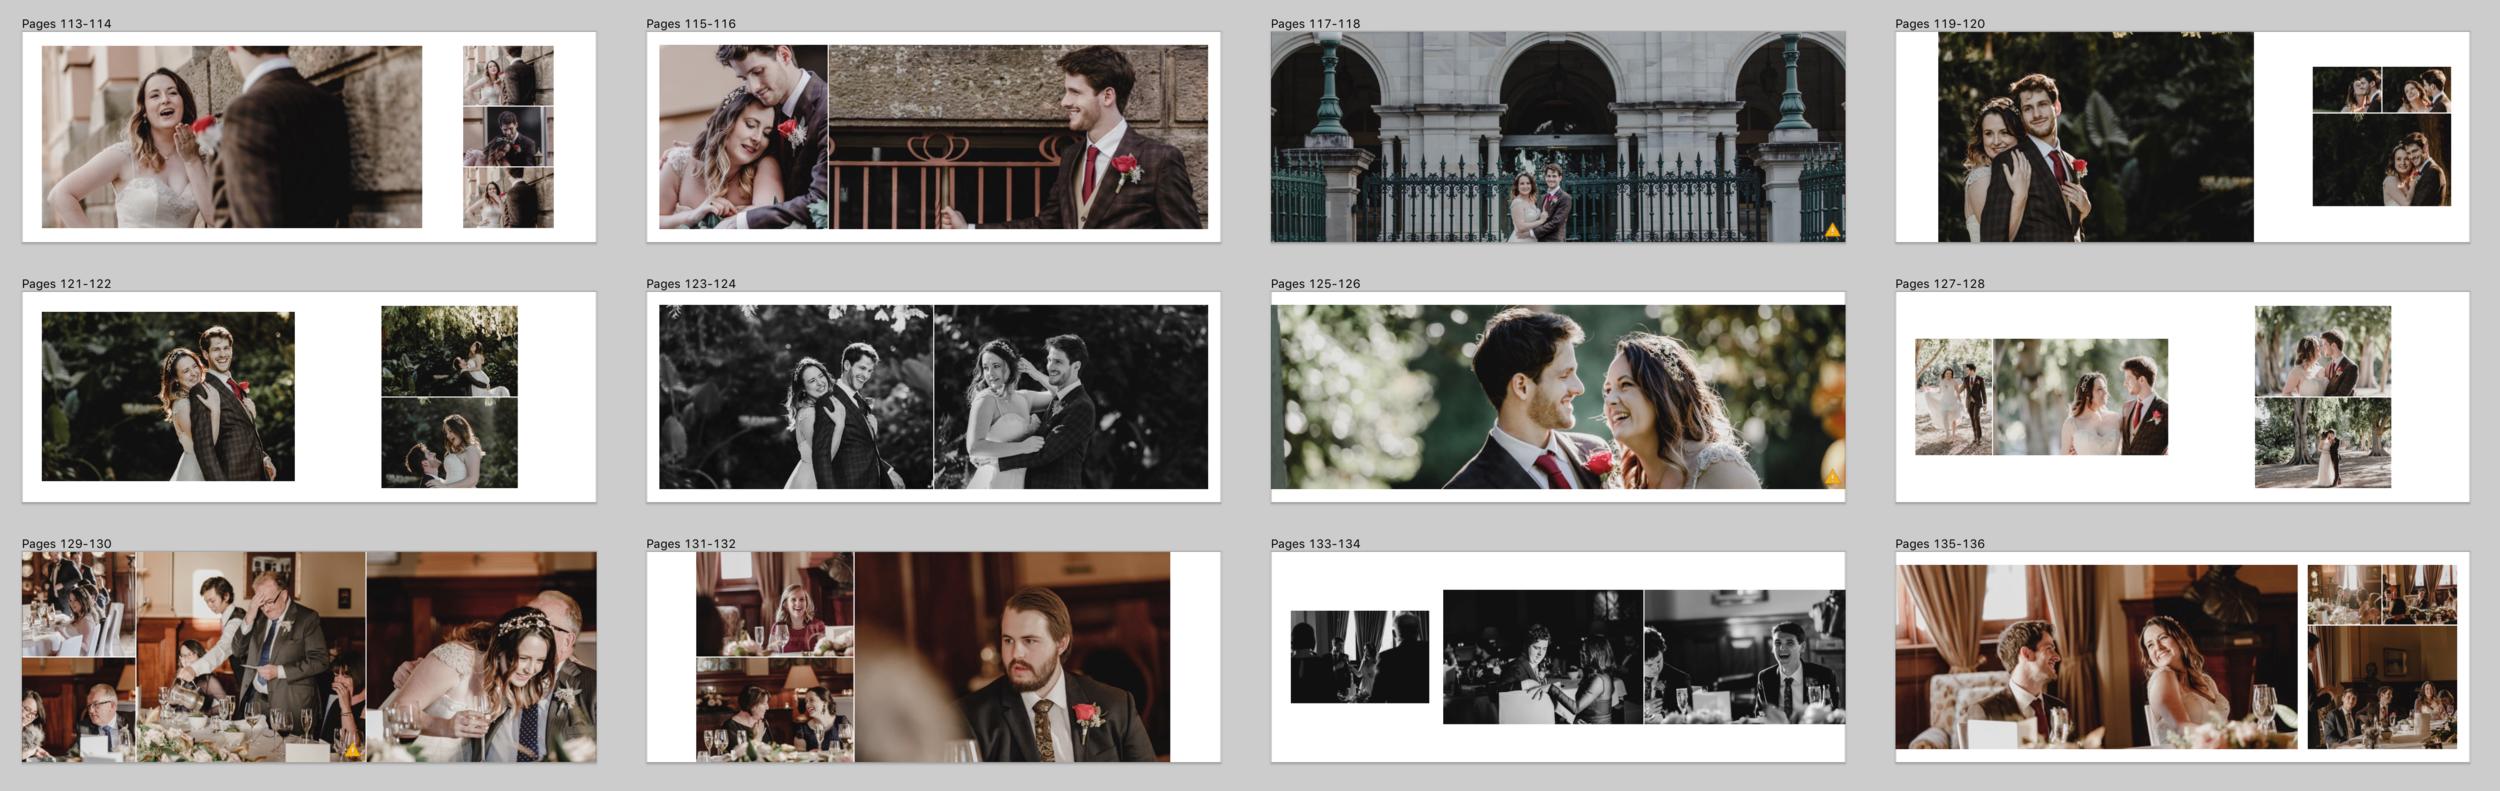 wedding-album.jpg